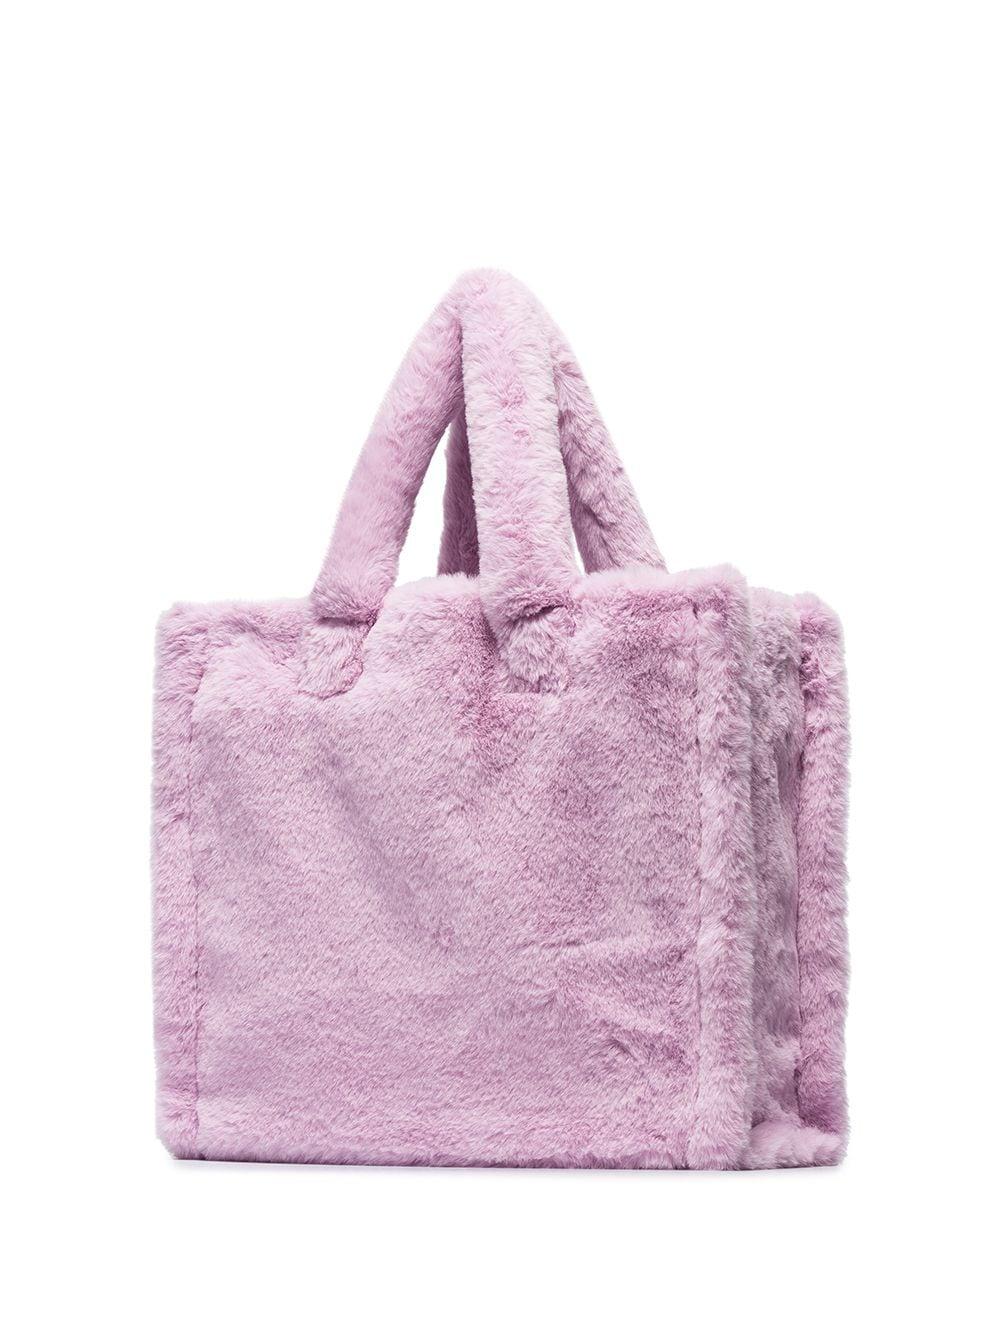 STAND STUDIO | сумка-тоут Lolita из искусственного меха | Clouty